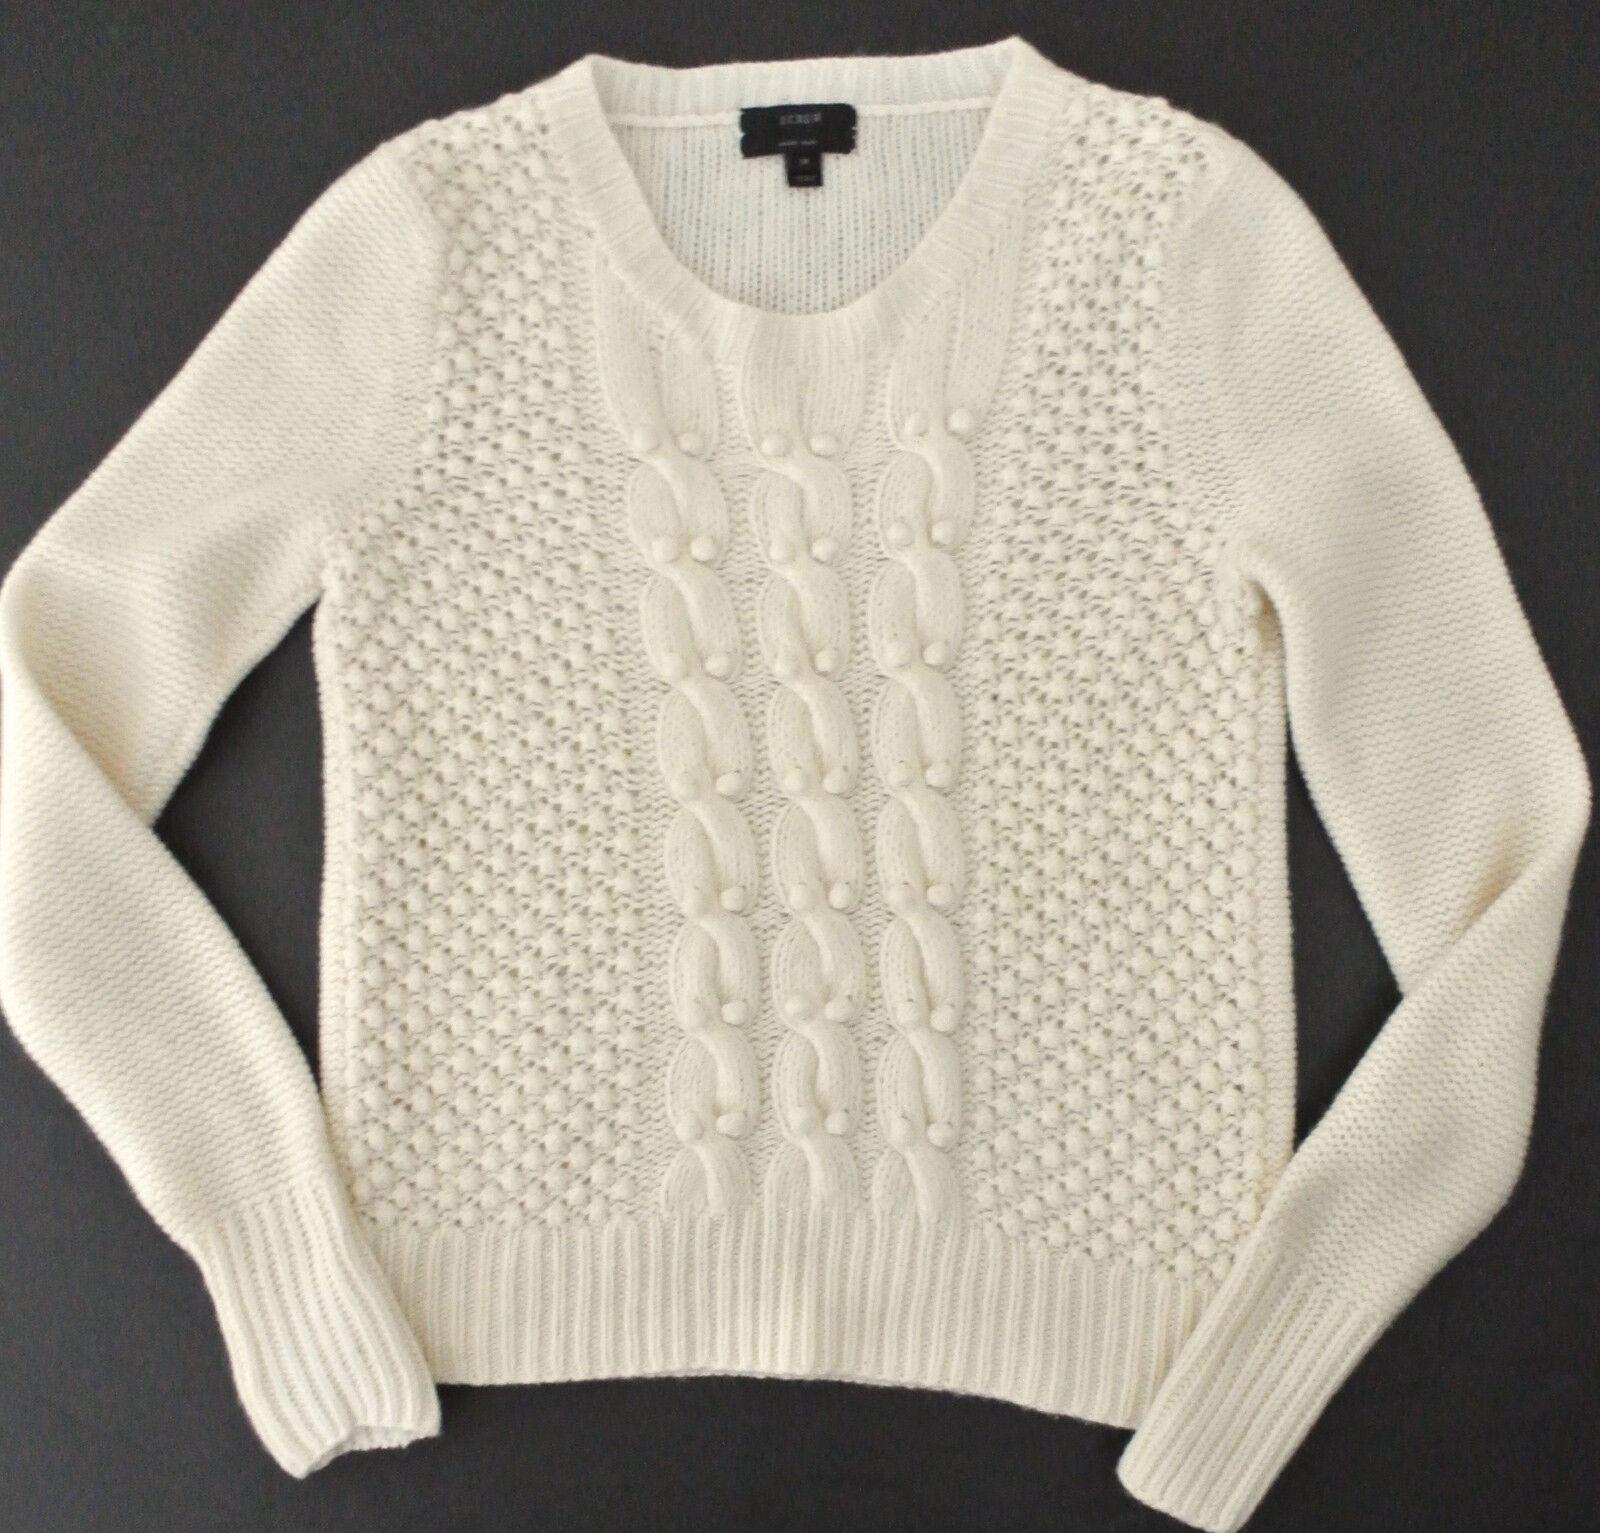 J CREW Handknit Popcorn Sweater sz M ivory lambswool